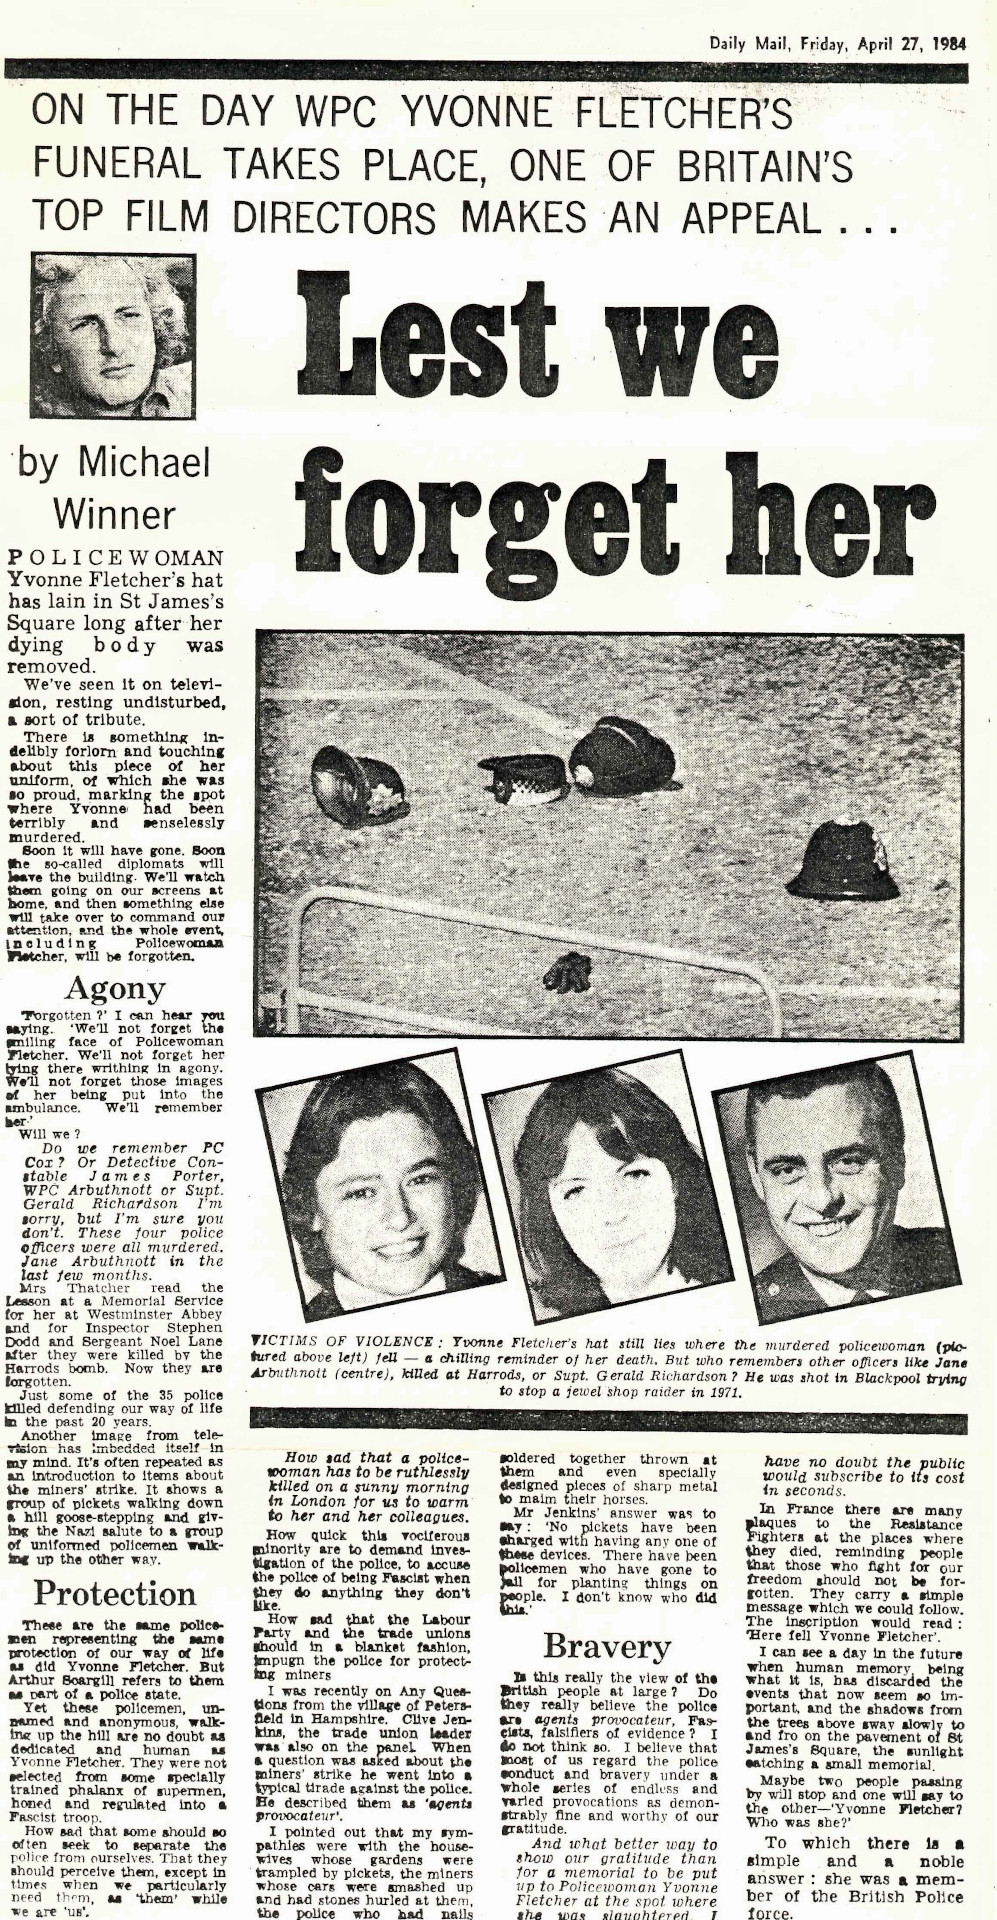 WPC Yvonne Fletcher Daily Mail Press Cutting